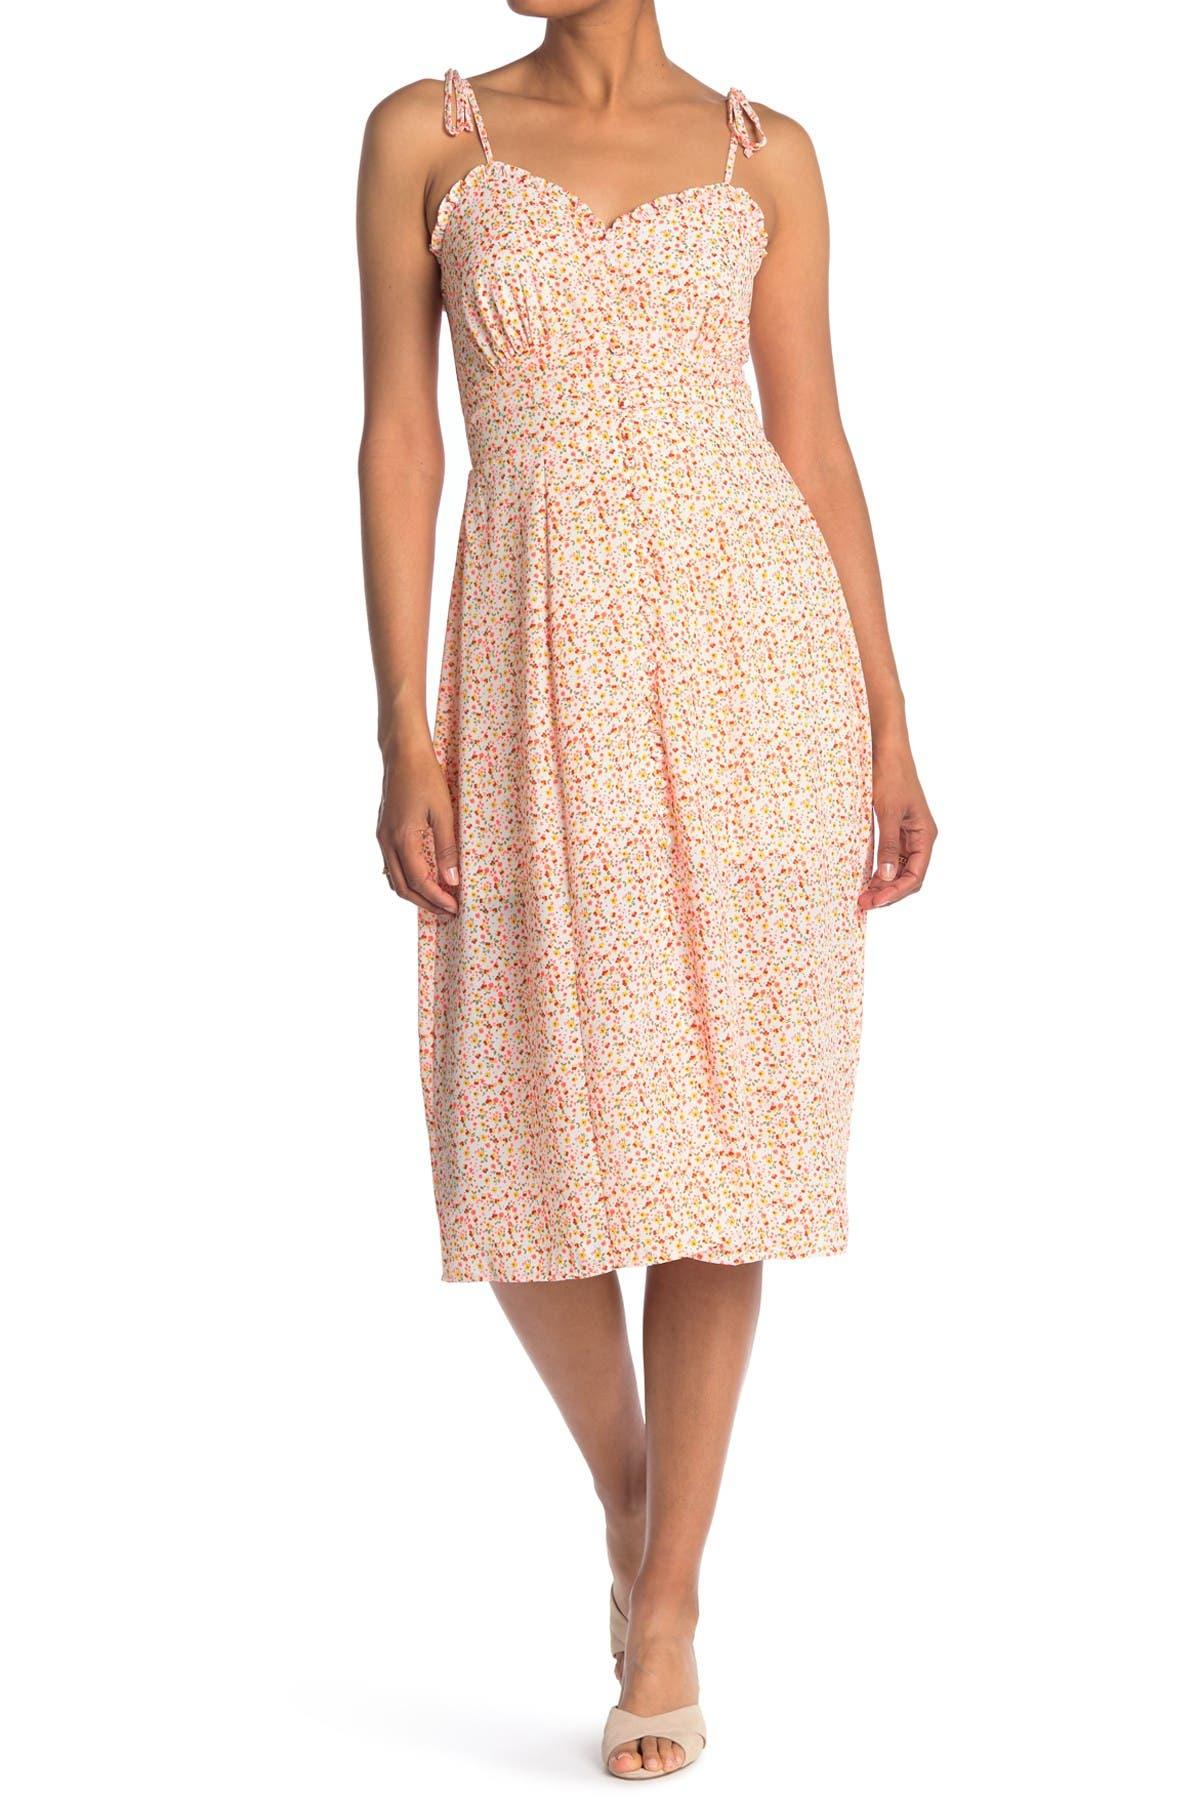 Image of ROW A Spaghetti Tie Strap Midi Dress